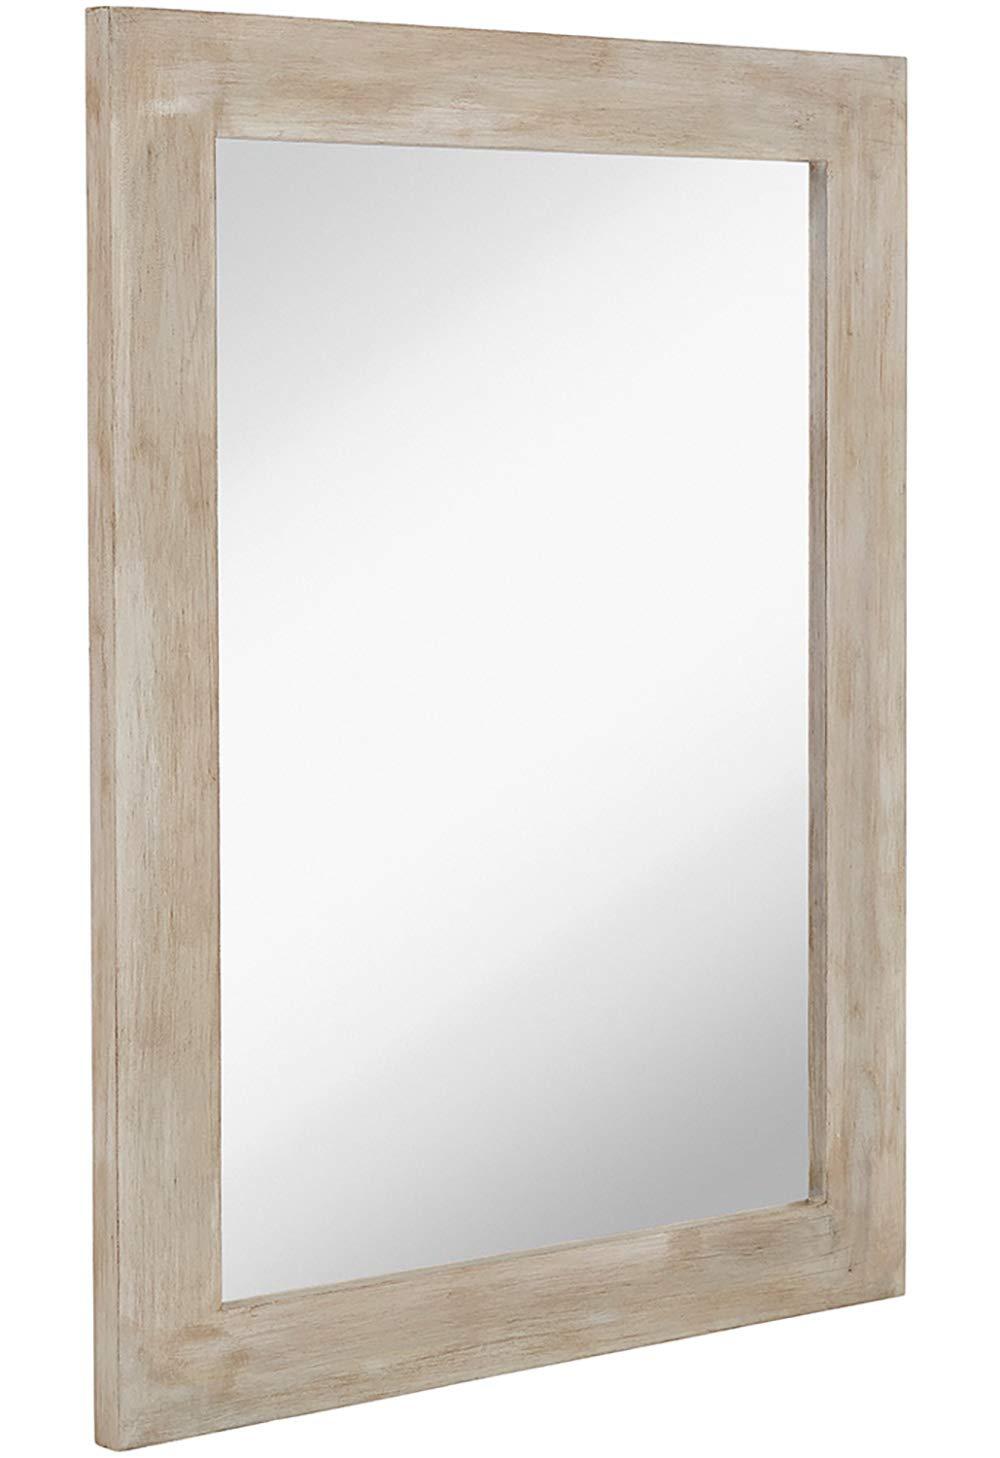 "Hamilton Hills White Washed Wood Framed Mirror 30"" x 40"" Vanity Mirror Rustic Beach Feel Wall Mirrored Frame"